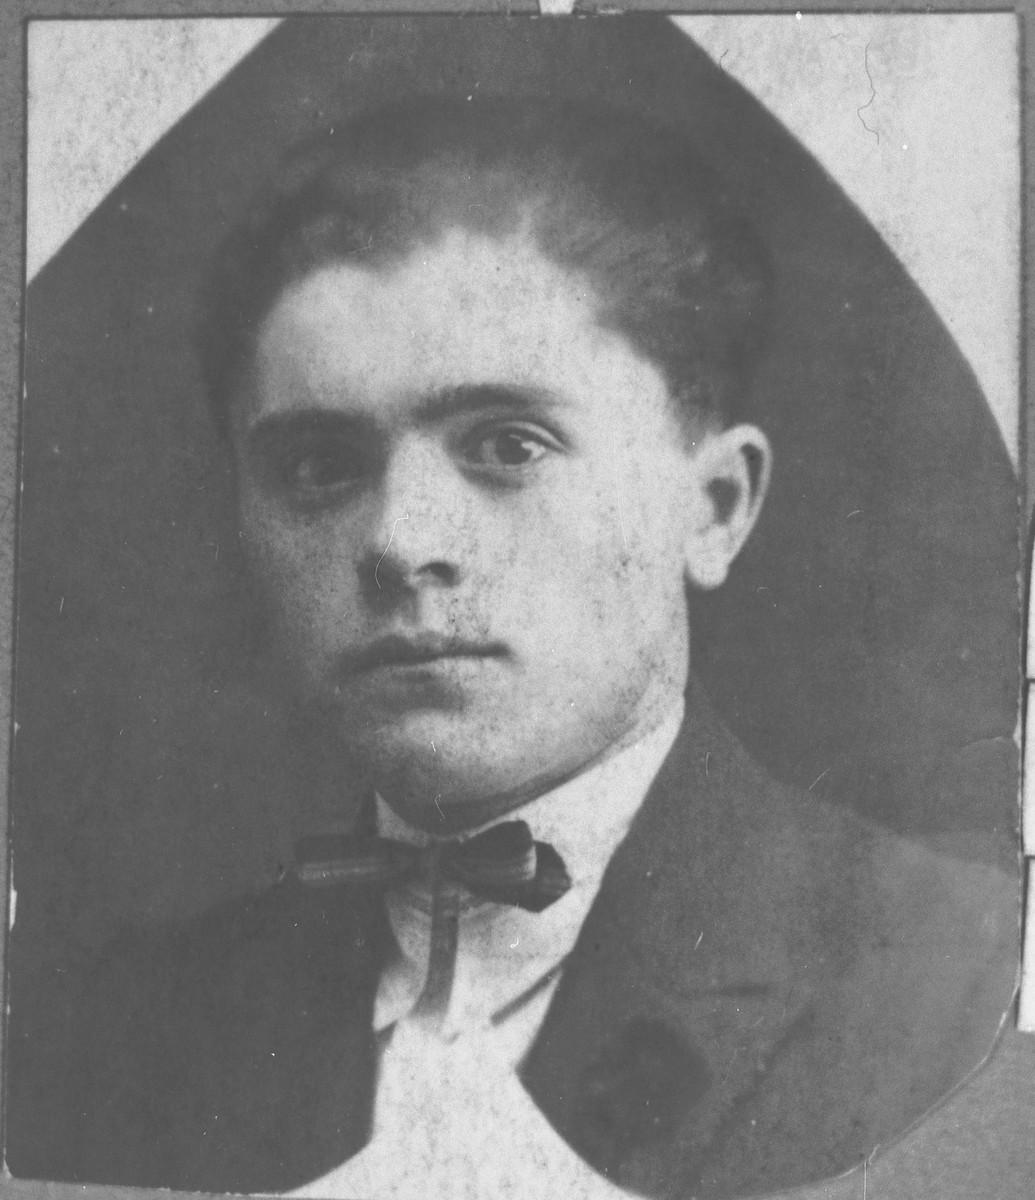 Portrait of Yosef Israel, son of Rachamin Israel.  He was a storekeeper.